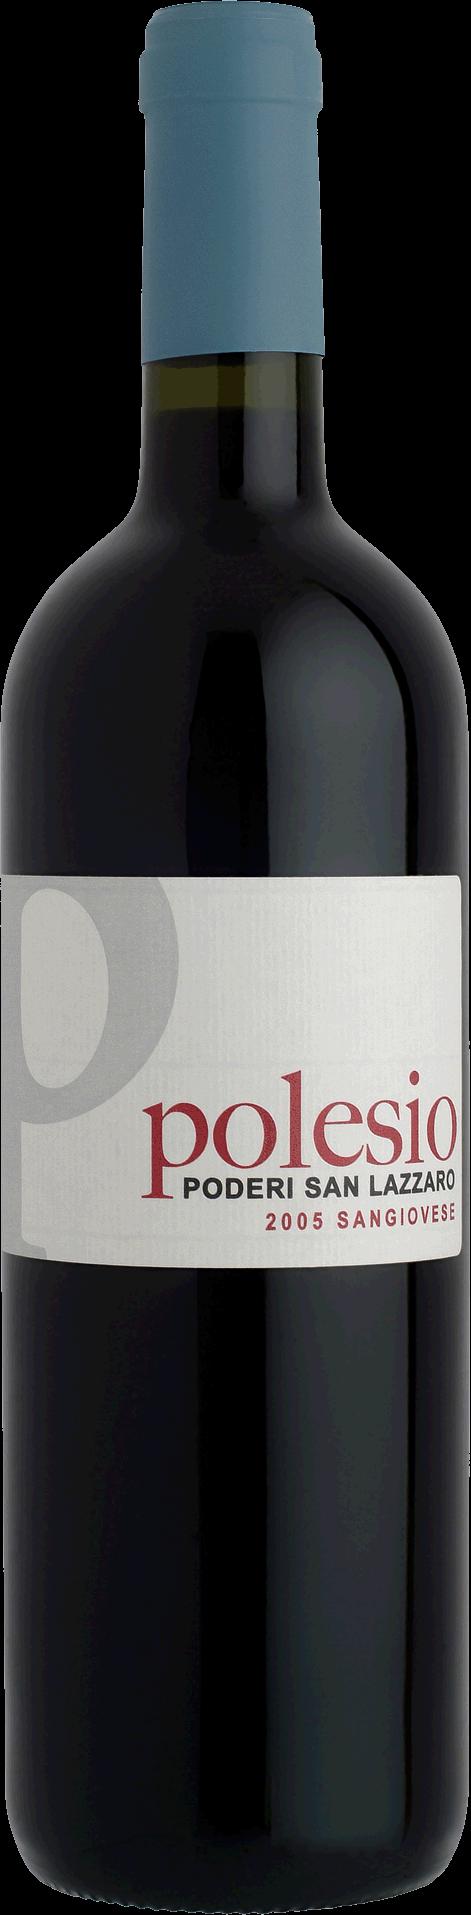 Polesio 2016